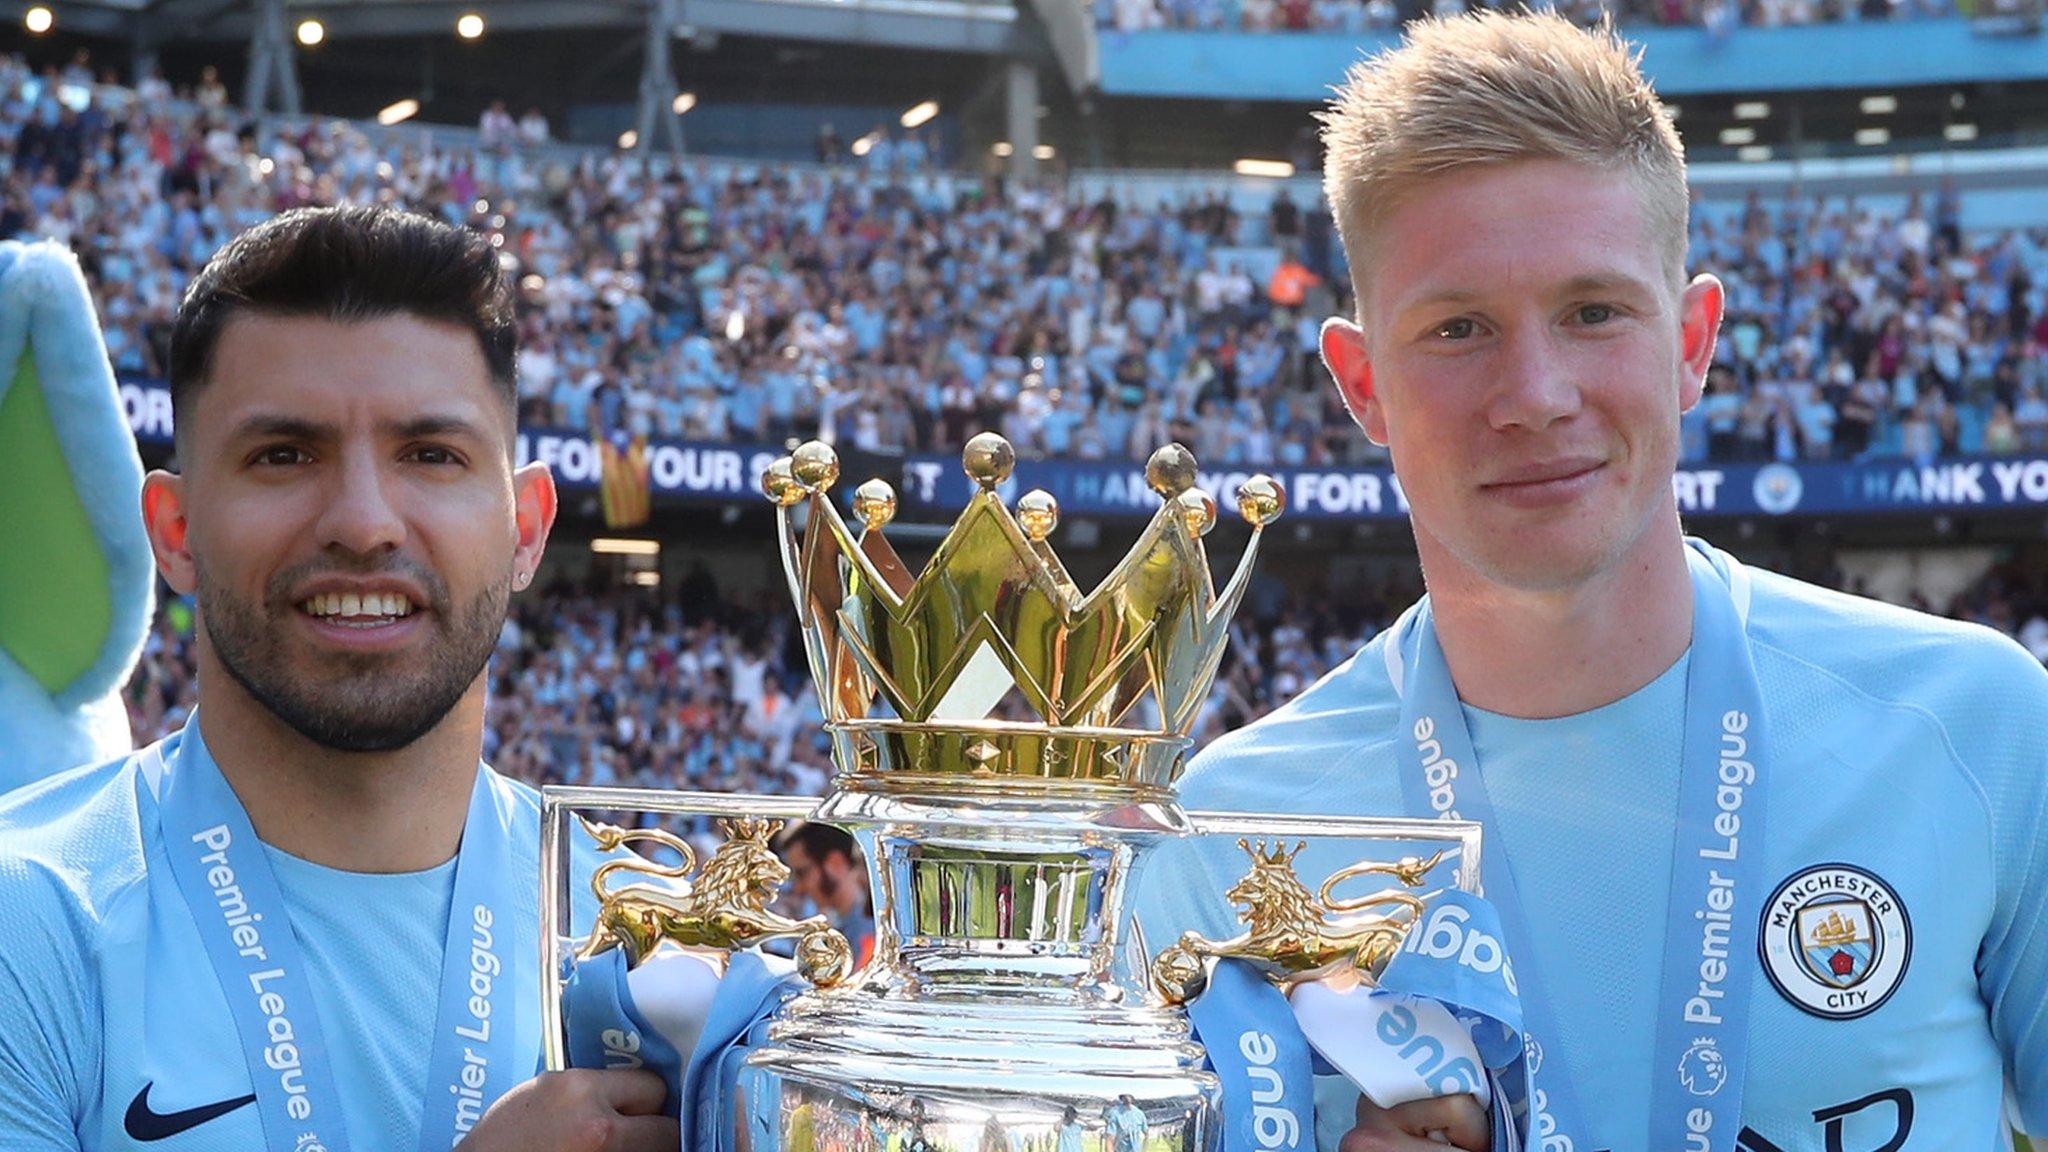 Kevin de Bruyne: Man City quadruple 'nearly impossible', says midfielder